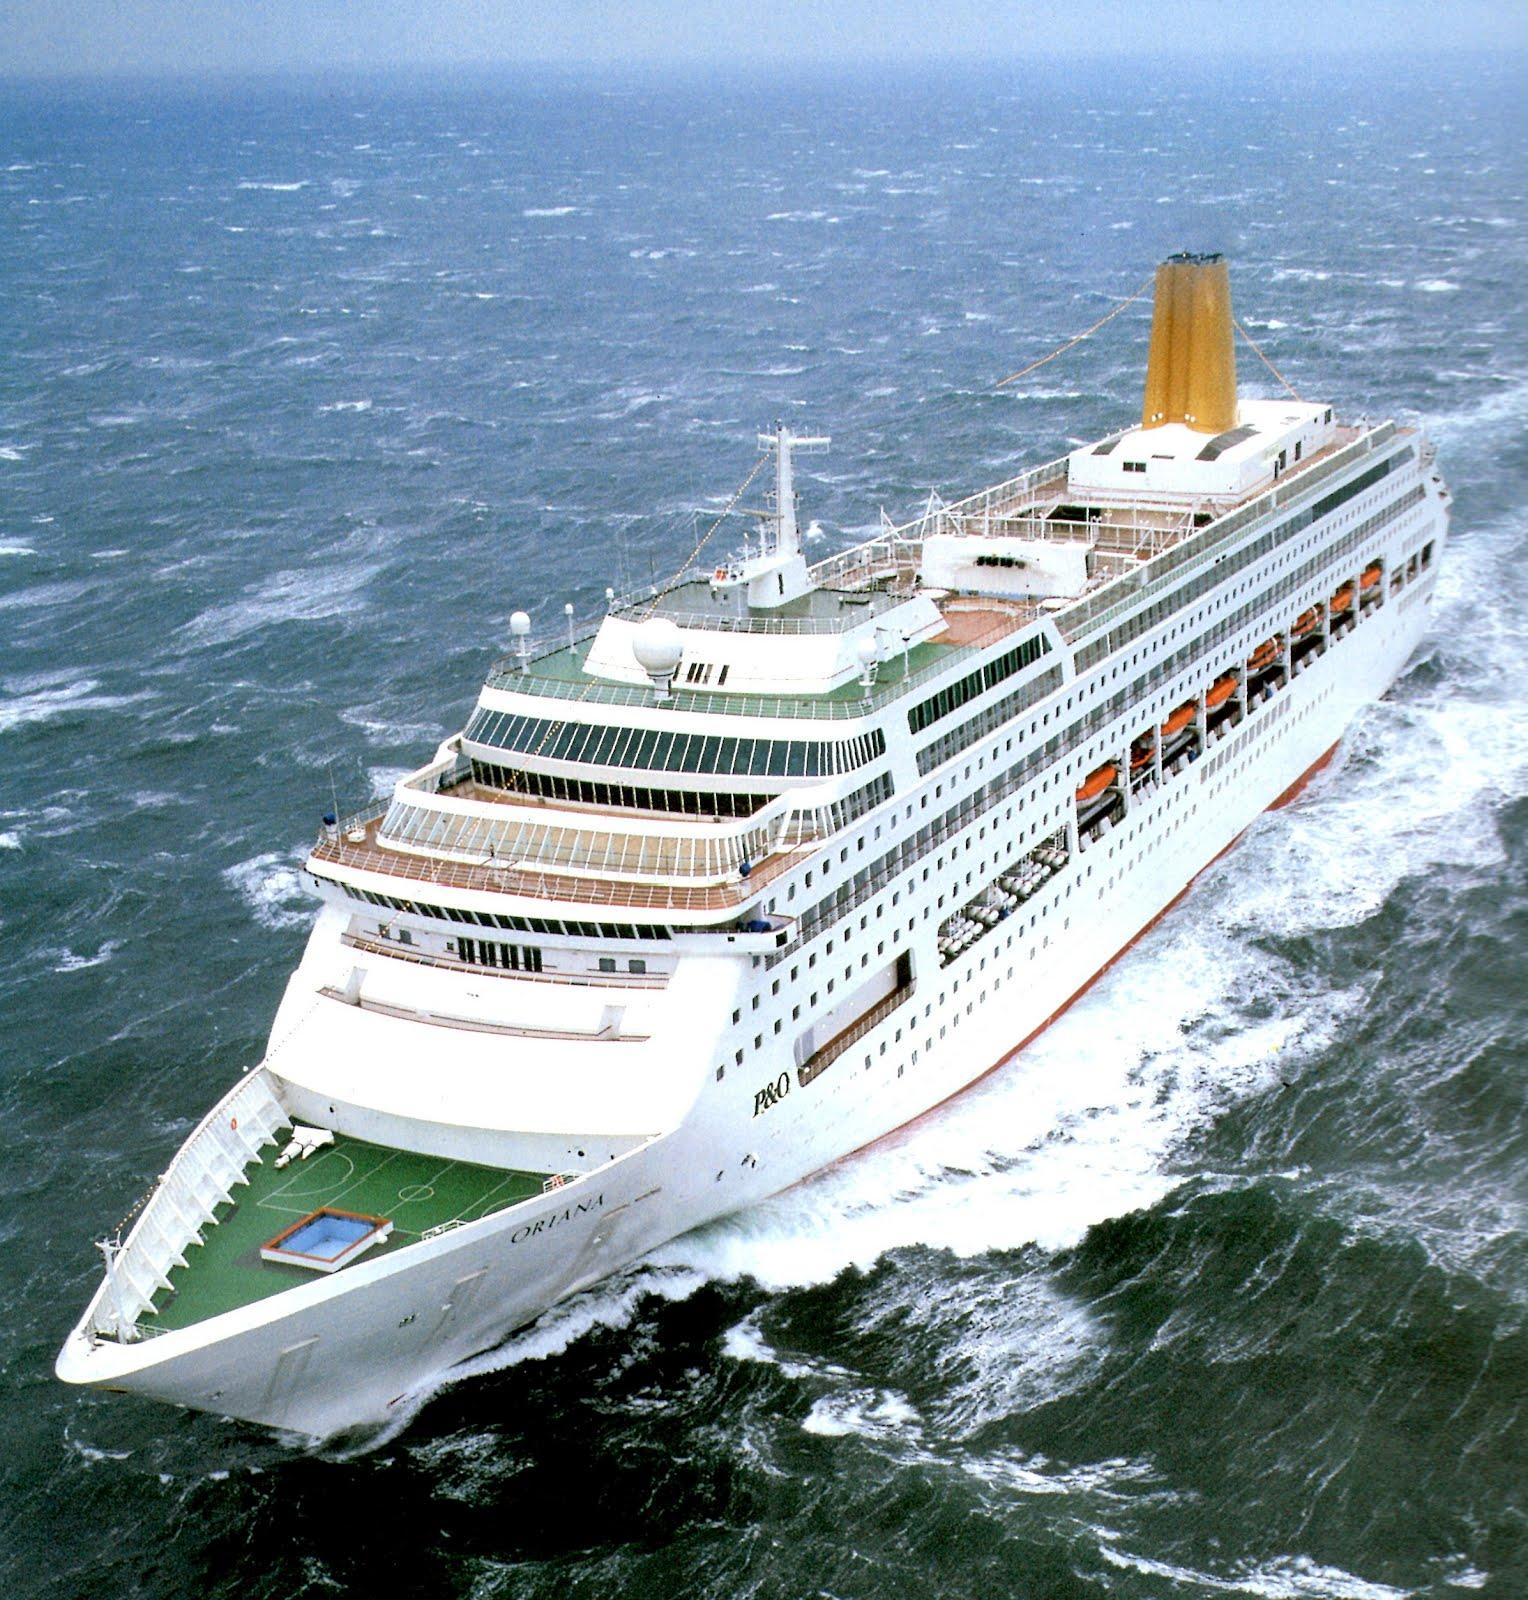 ORIANA Of 1995: ORIANA-A Ship That Shaped The Future